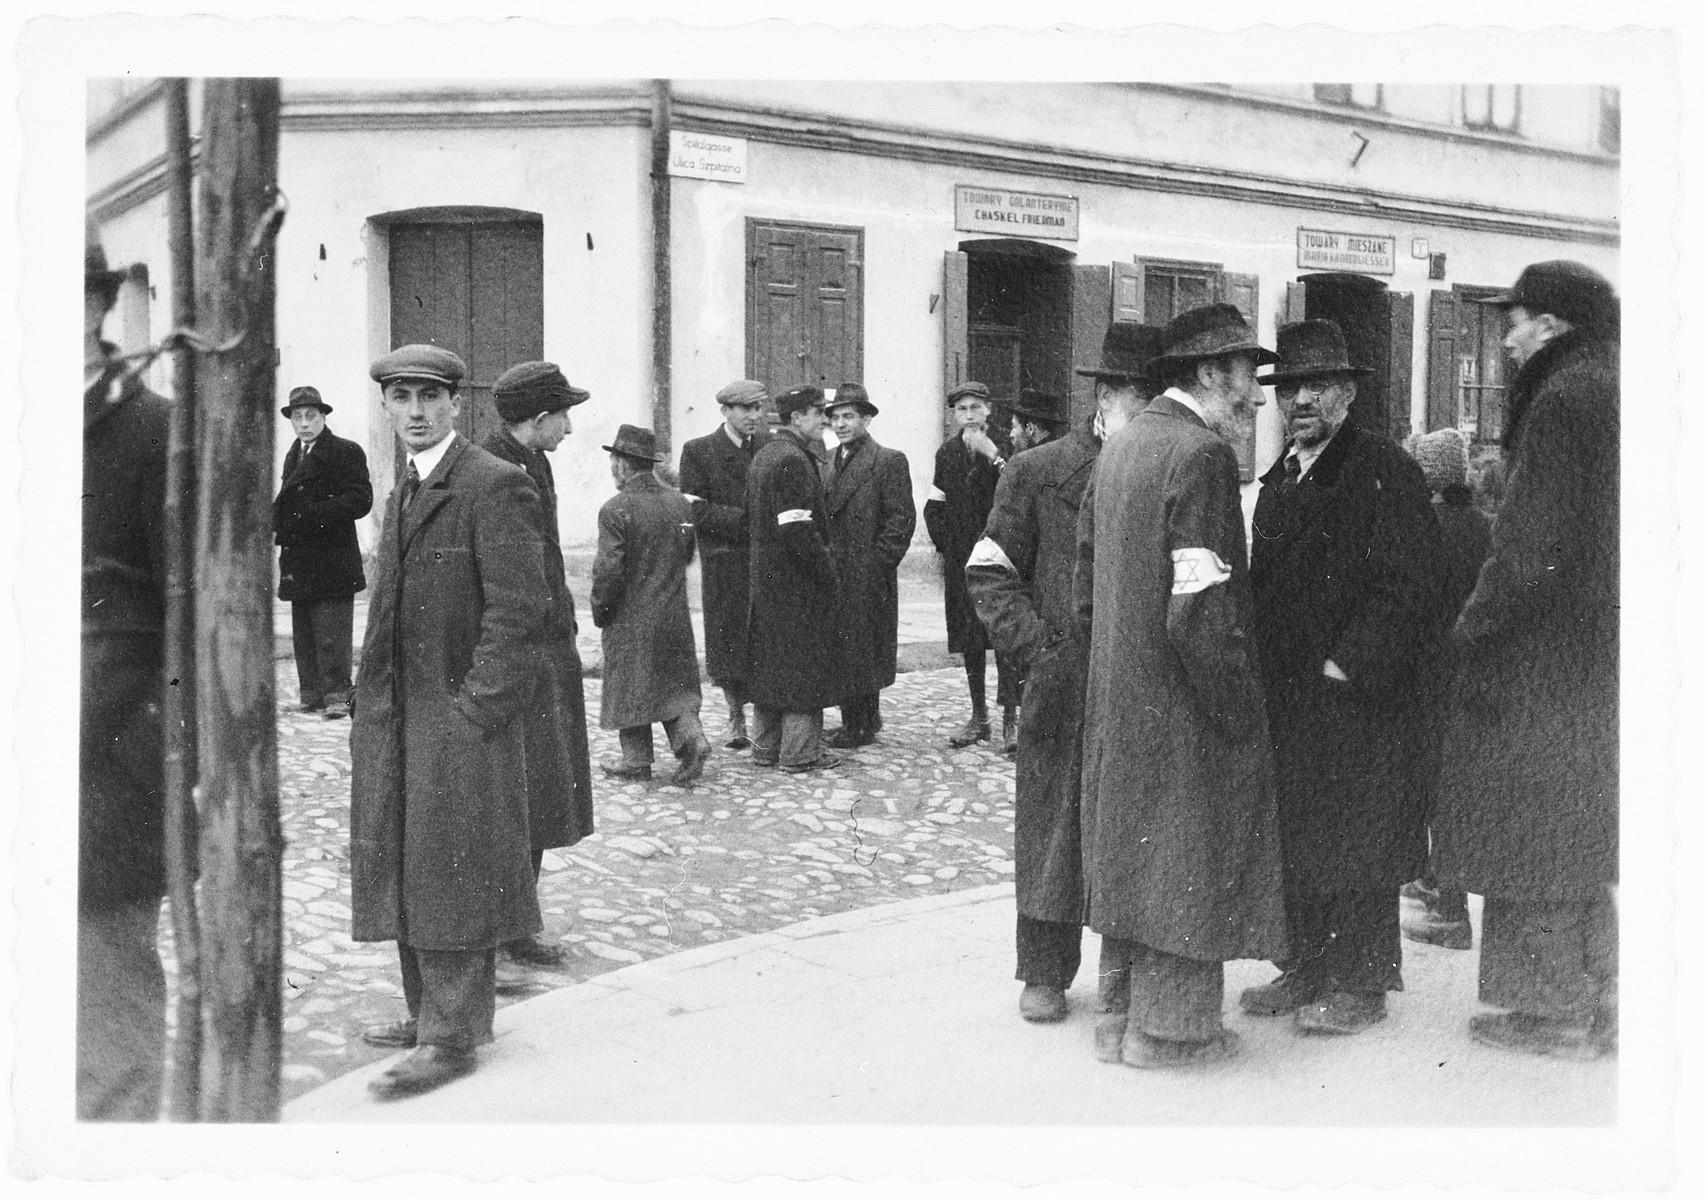 Polish Jews stand on a street corner of the [possibly Nowy Sacz] ghetto.